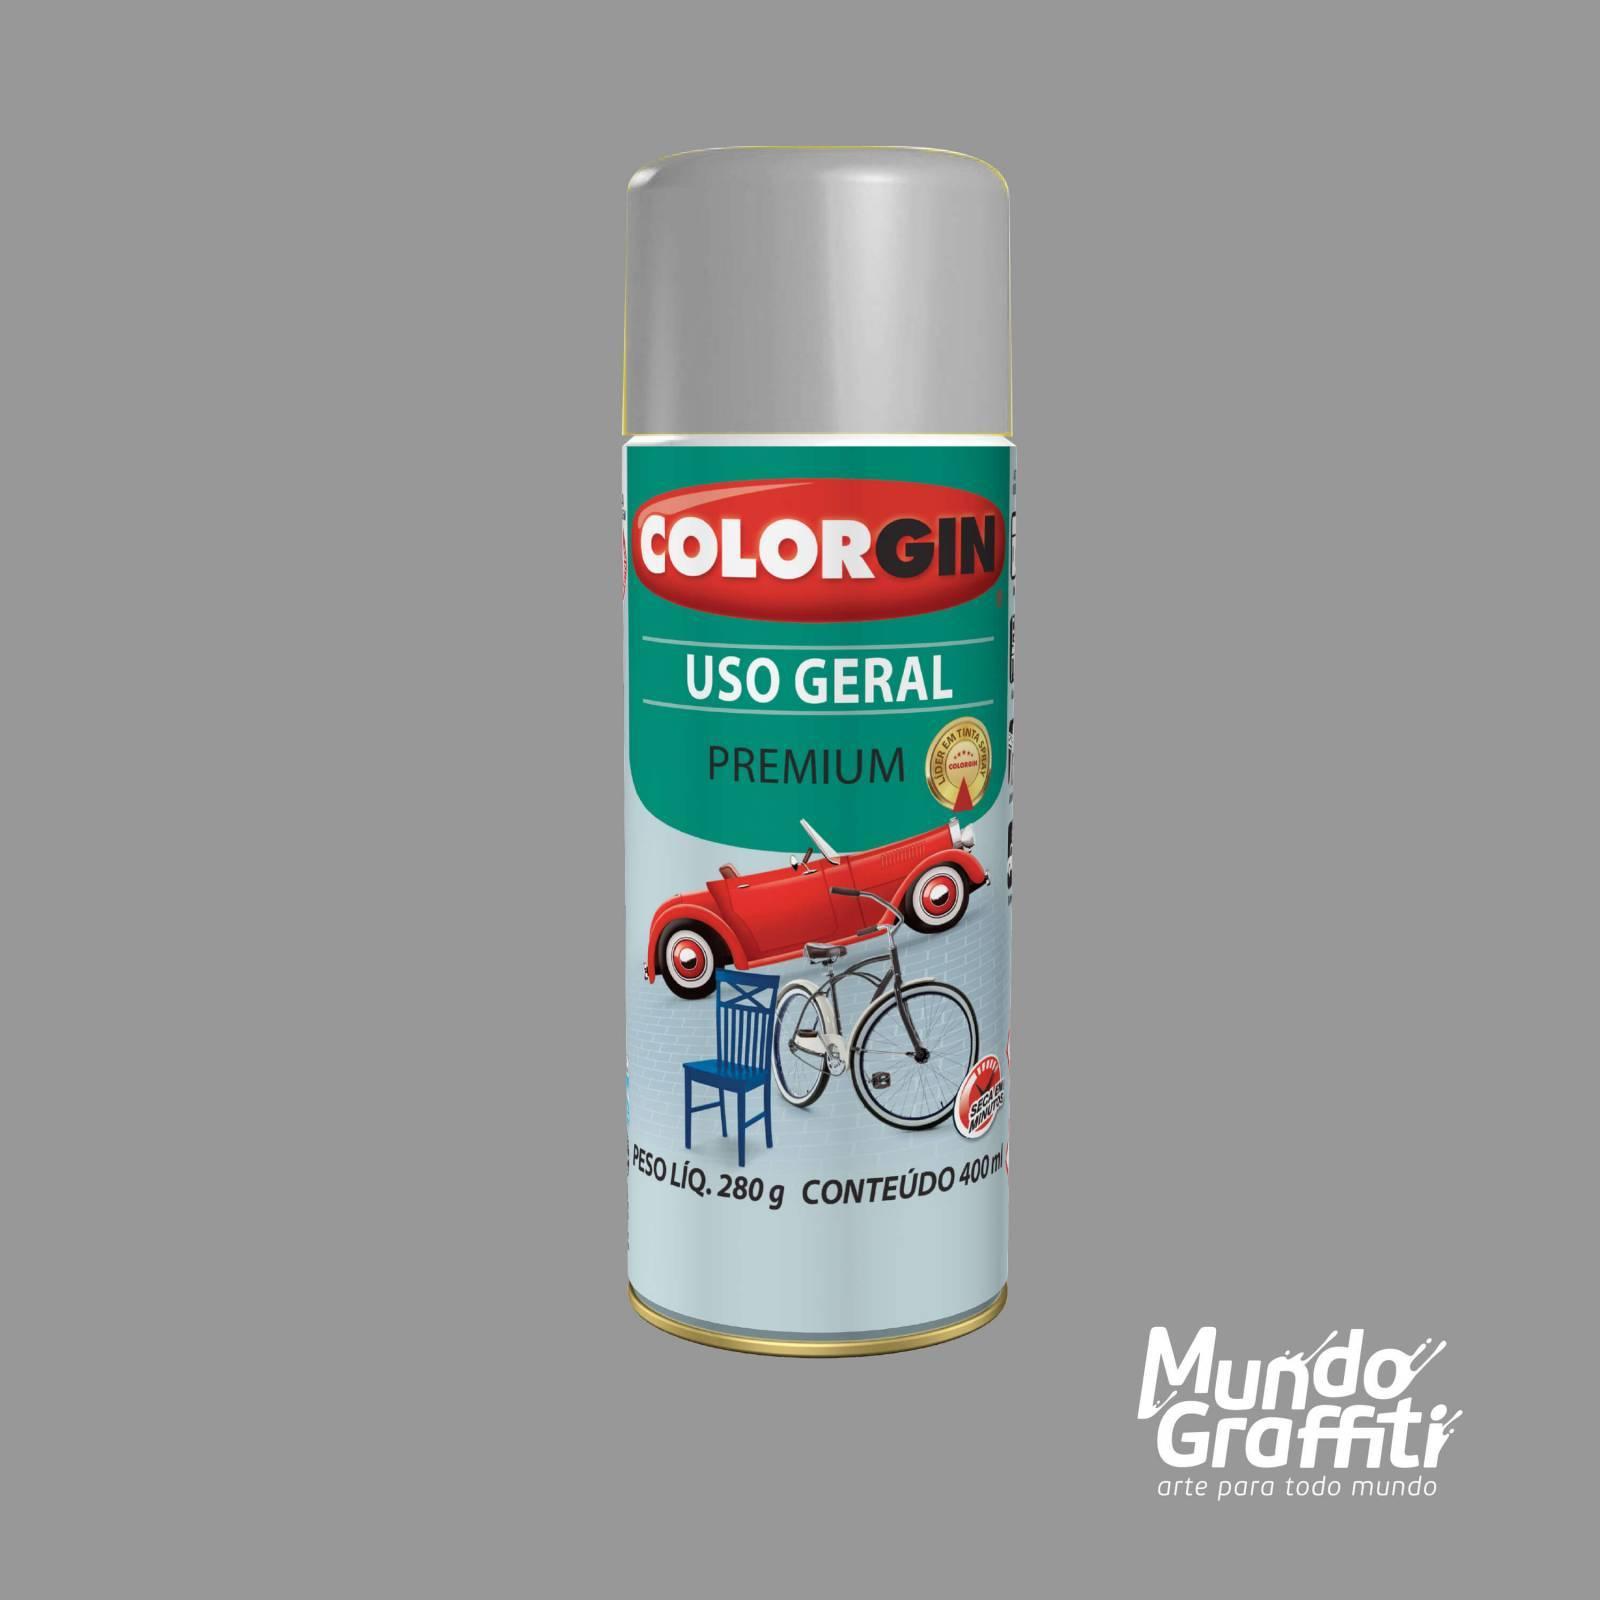 Tinta Spray Colorgin Uso Geral 55041 Cinza Placa 400ml - Mundo Graffiti